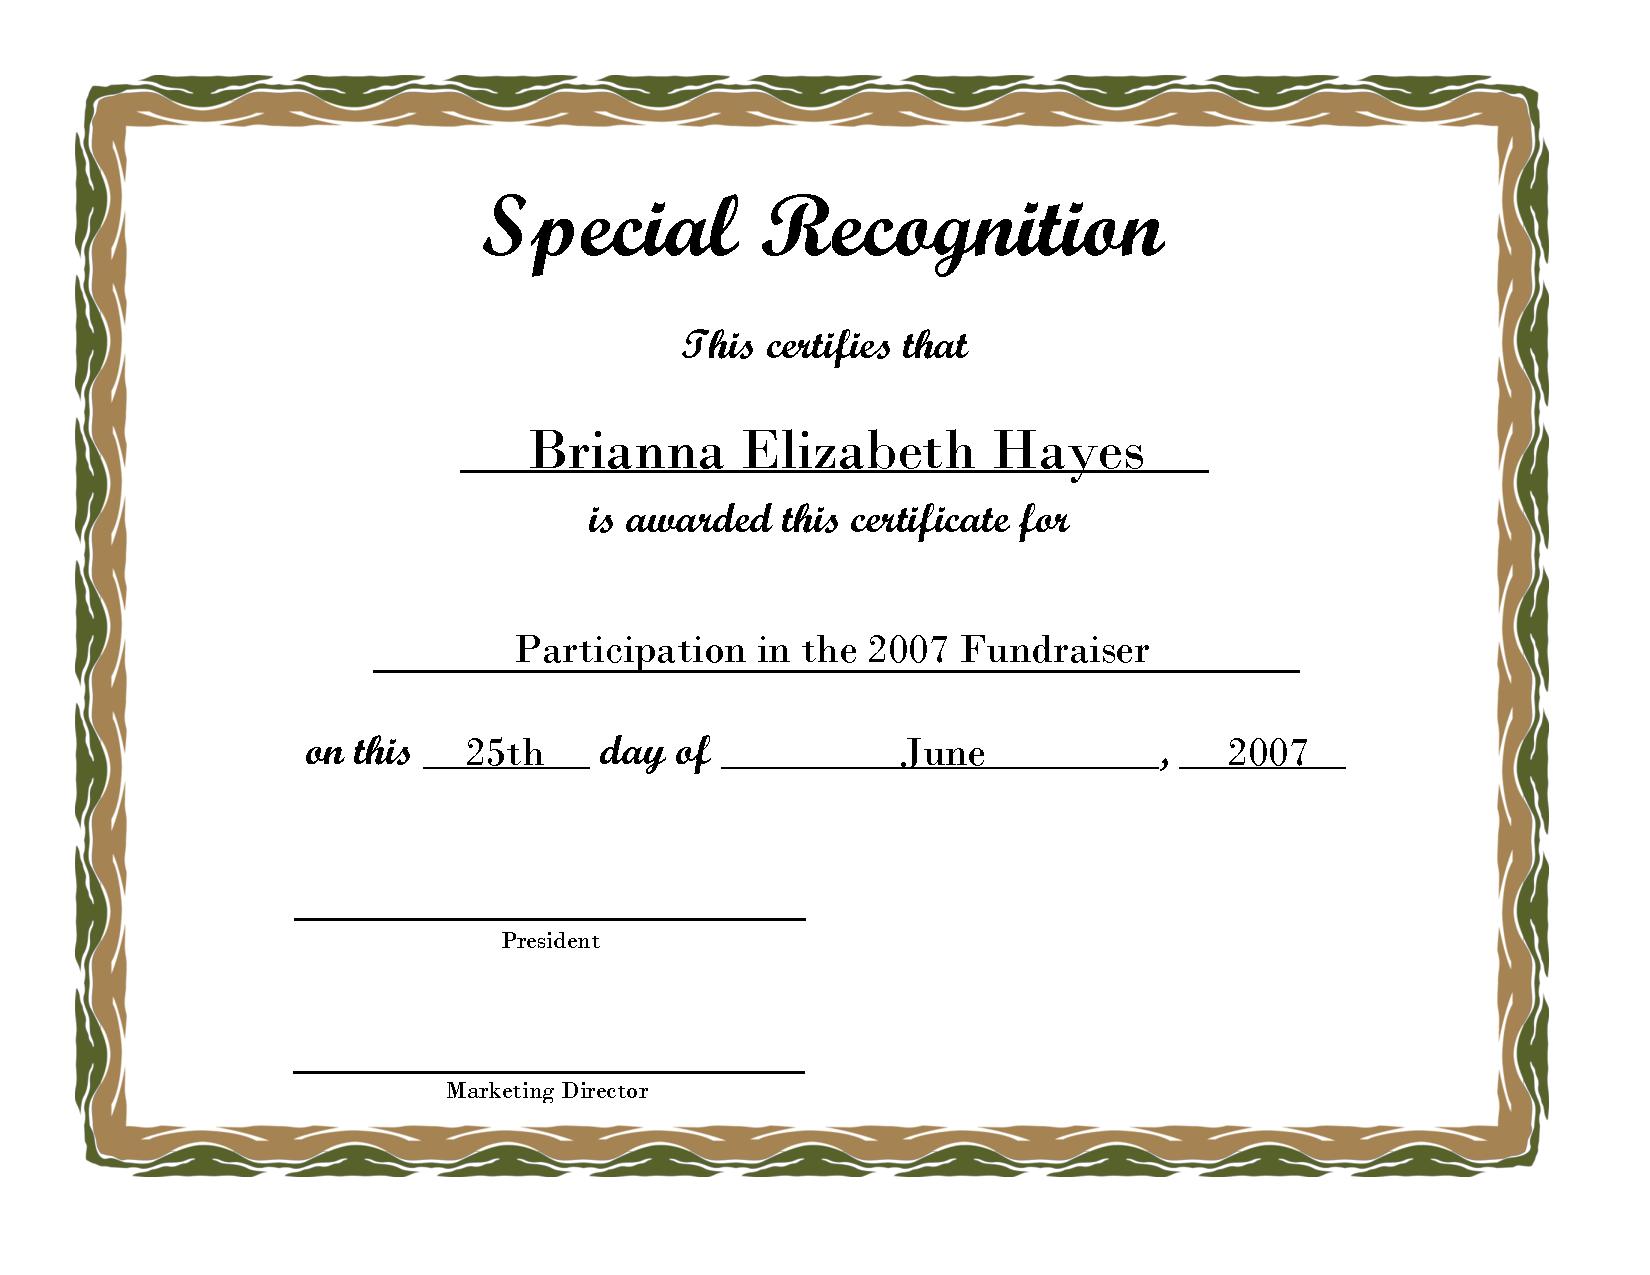 Free Printable Award Certificate Borders | Free Printable Certificate 2b - PNG Certificates Award